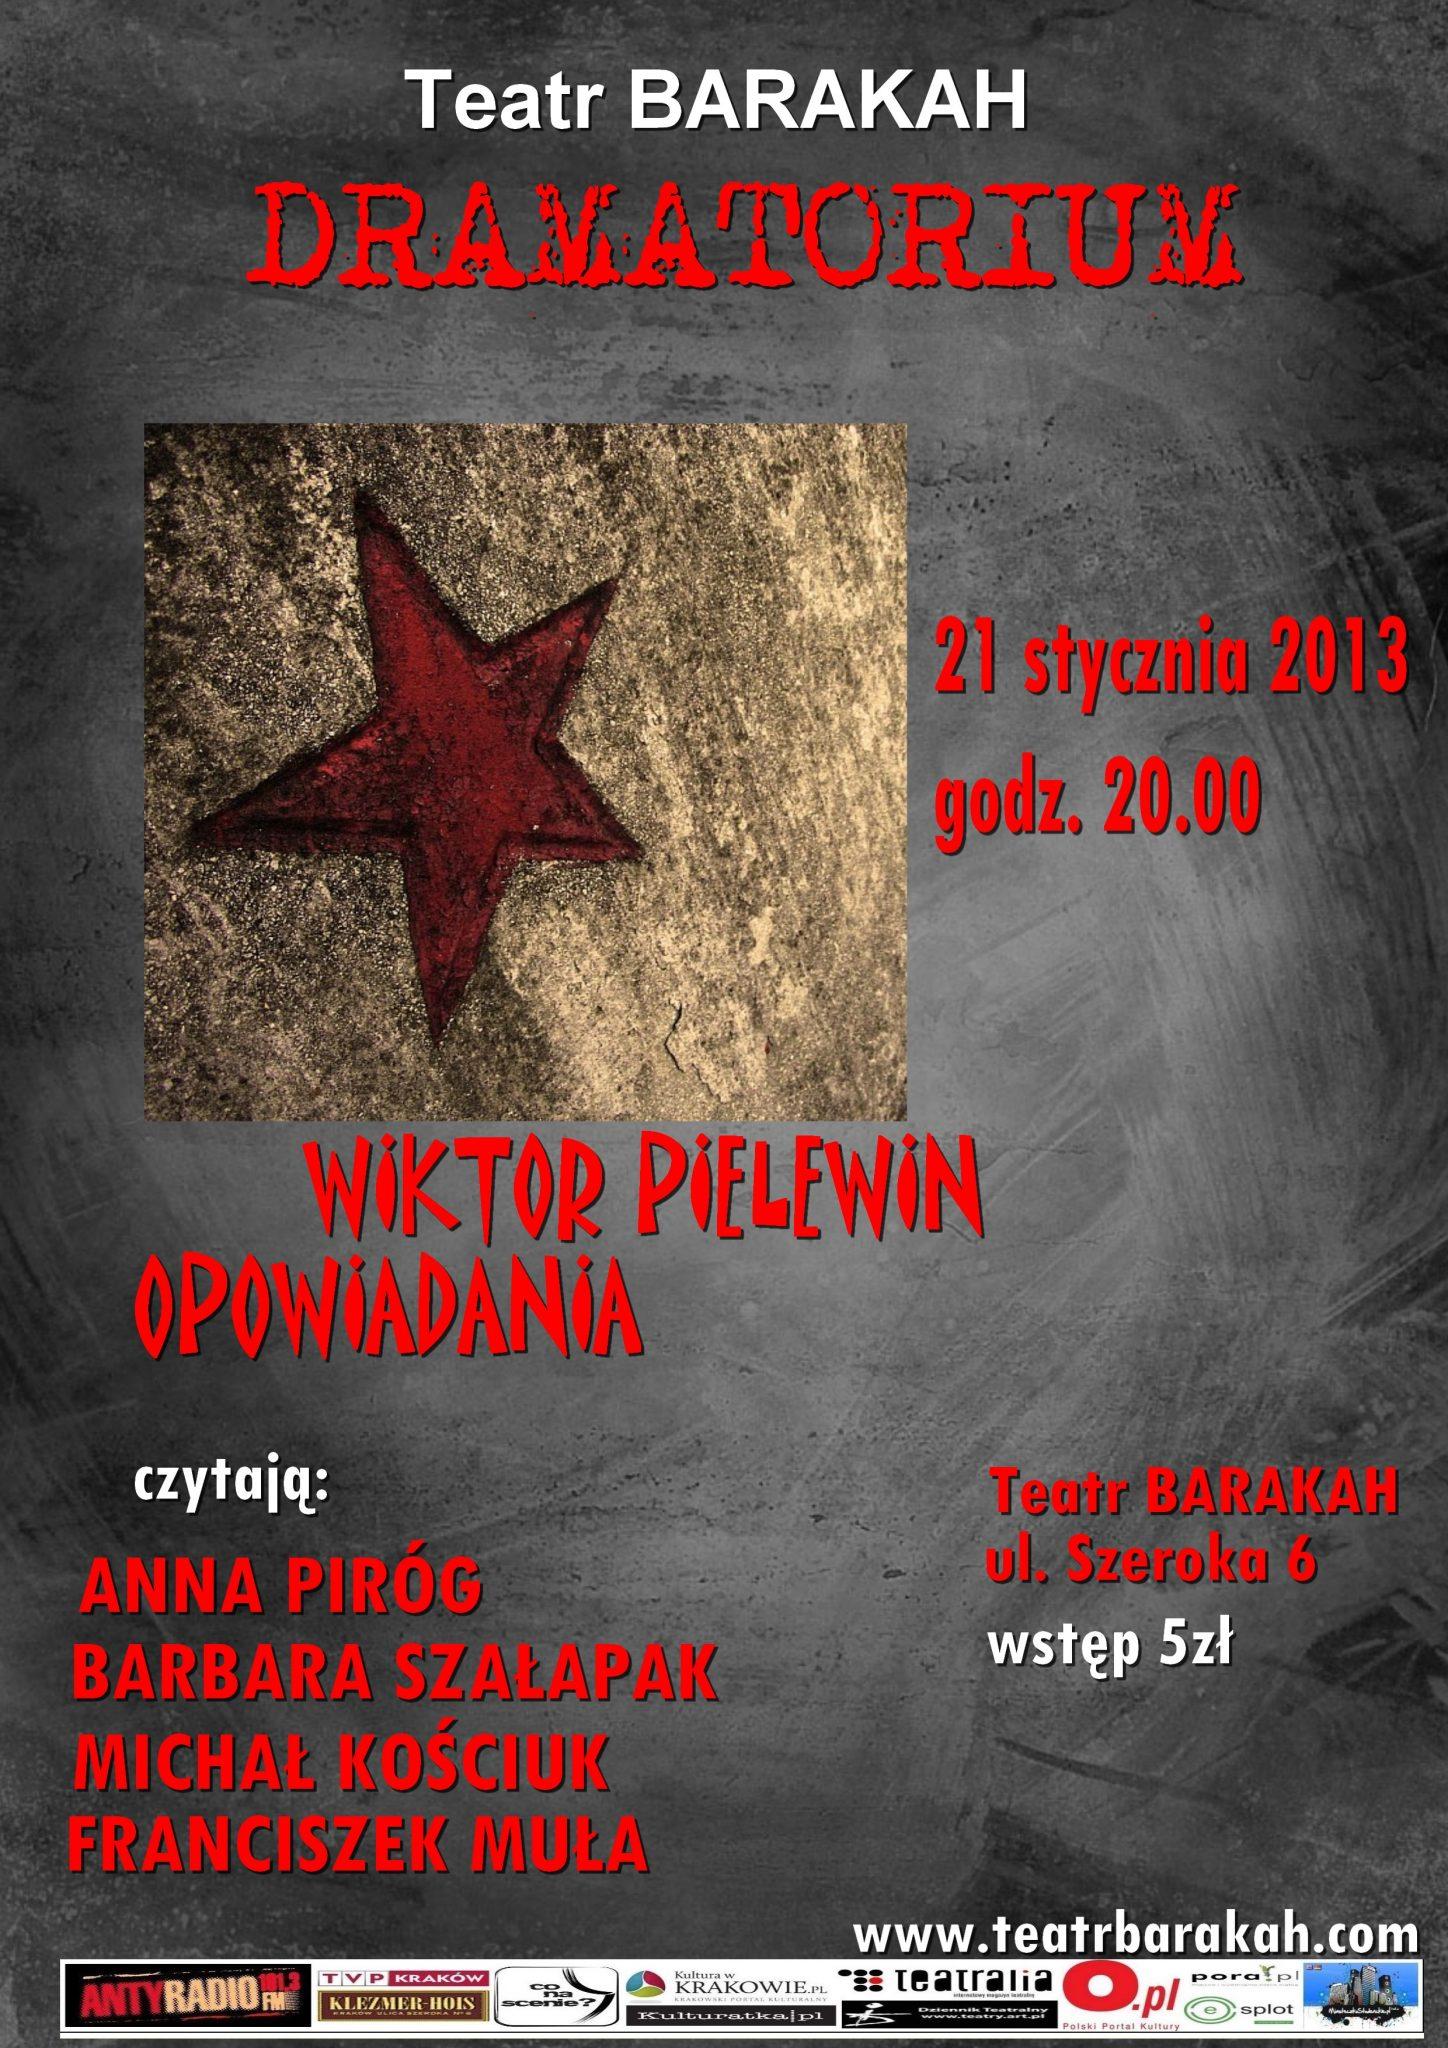 Pielewin 21.I.2013